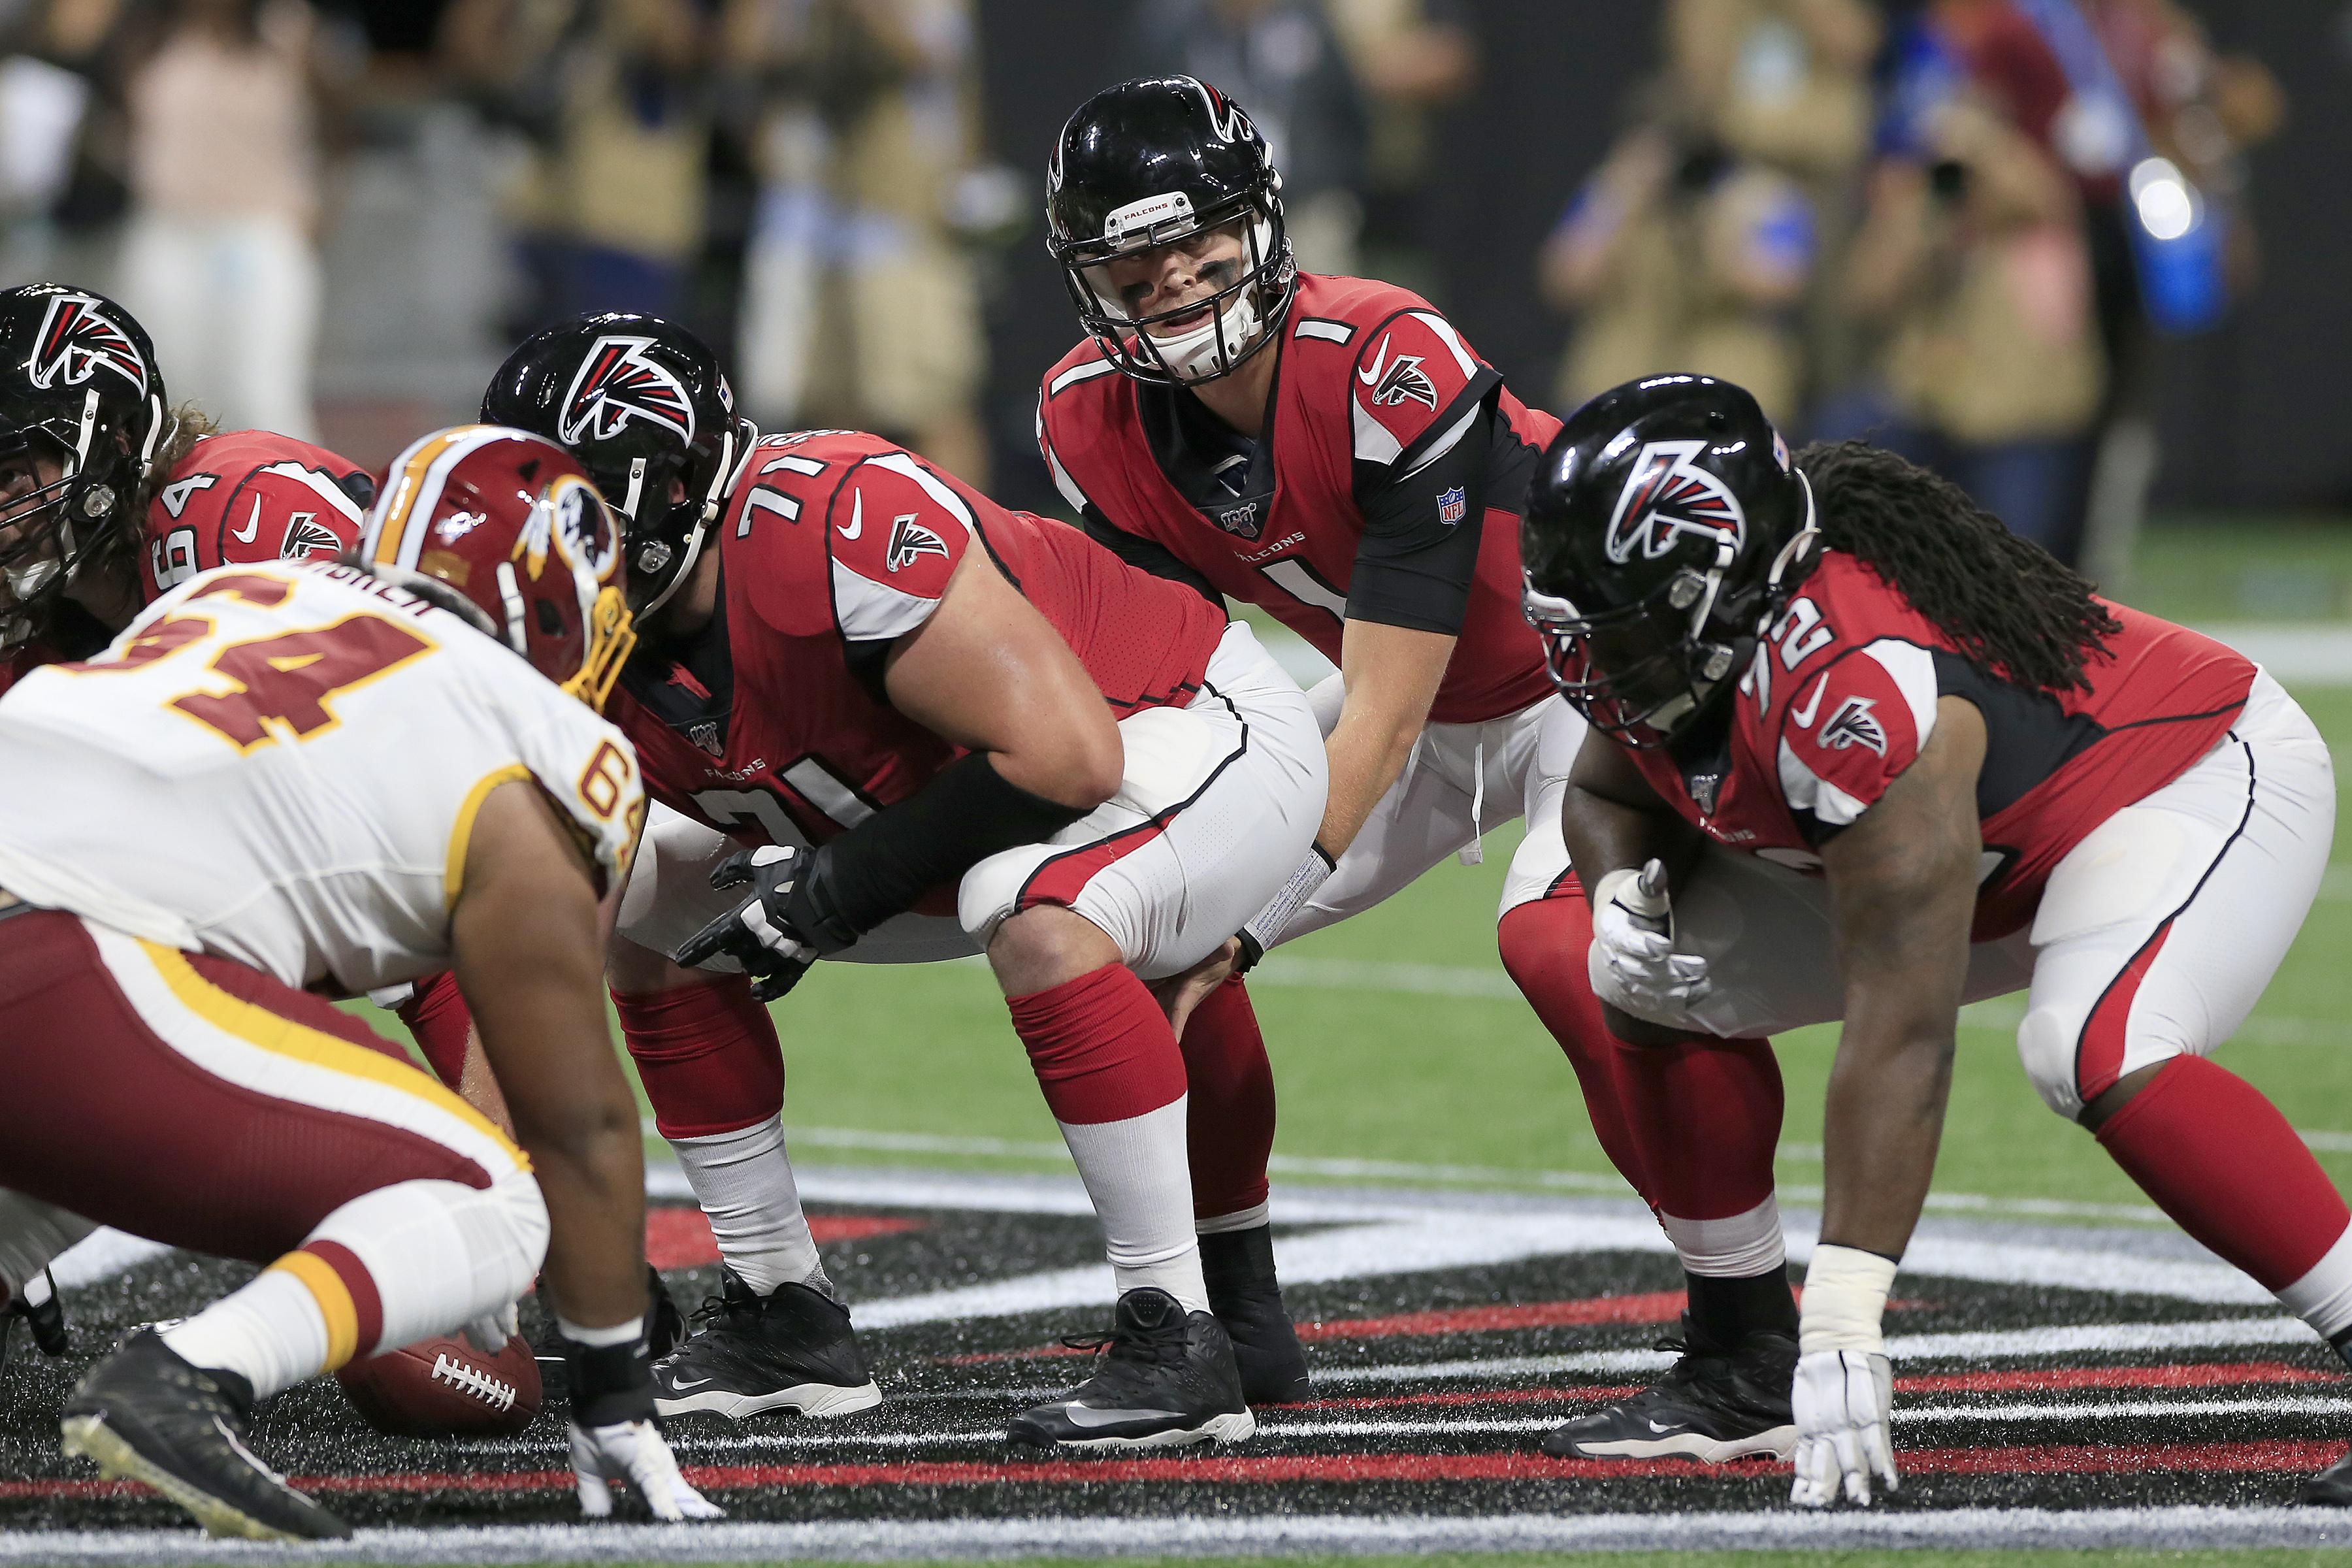 NFL: AUG 22 Preseason - Redskins at Falcons